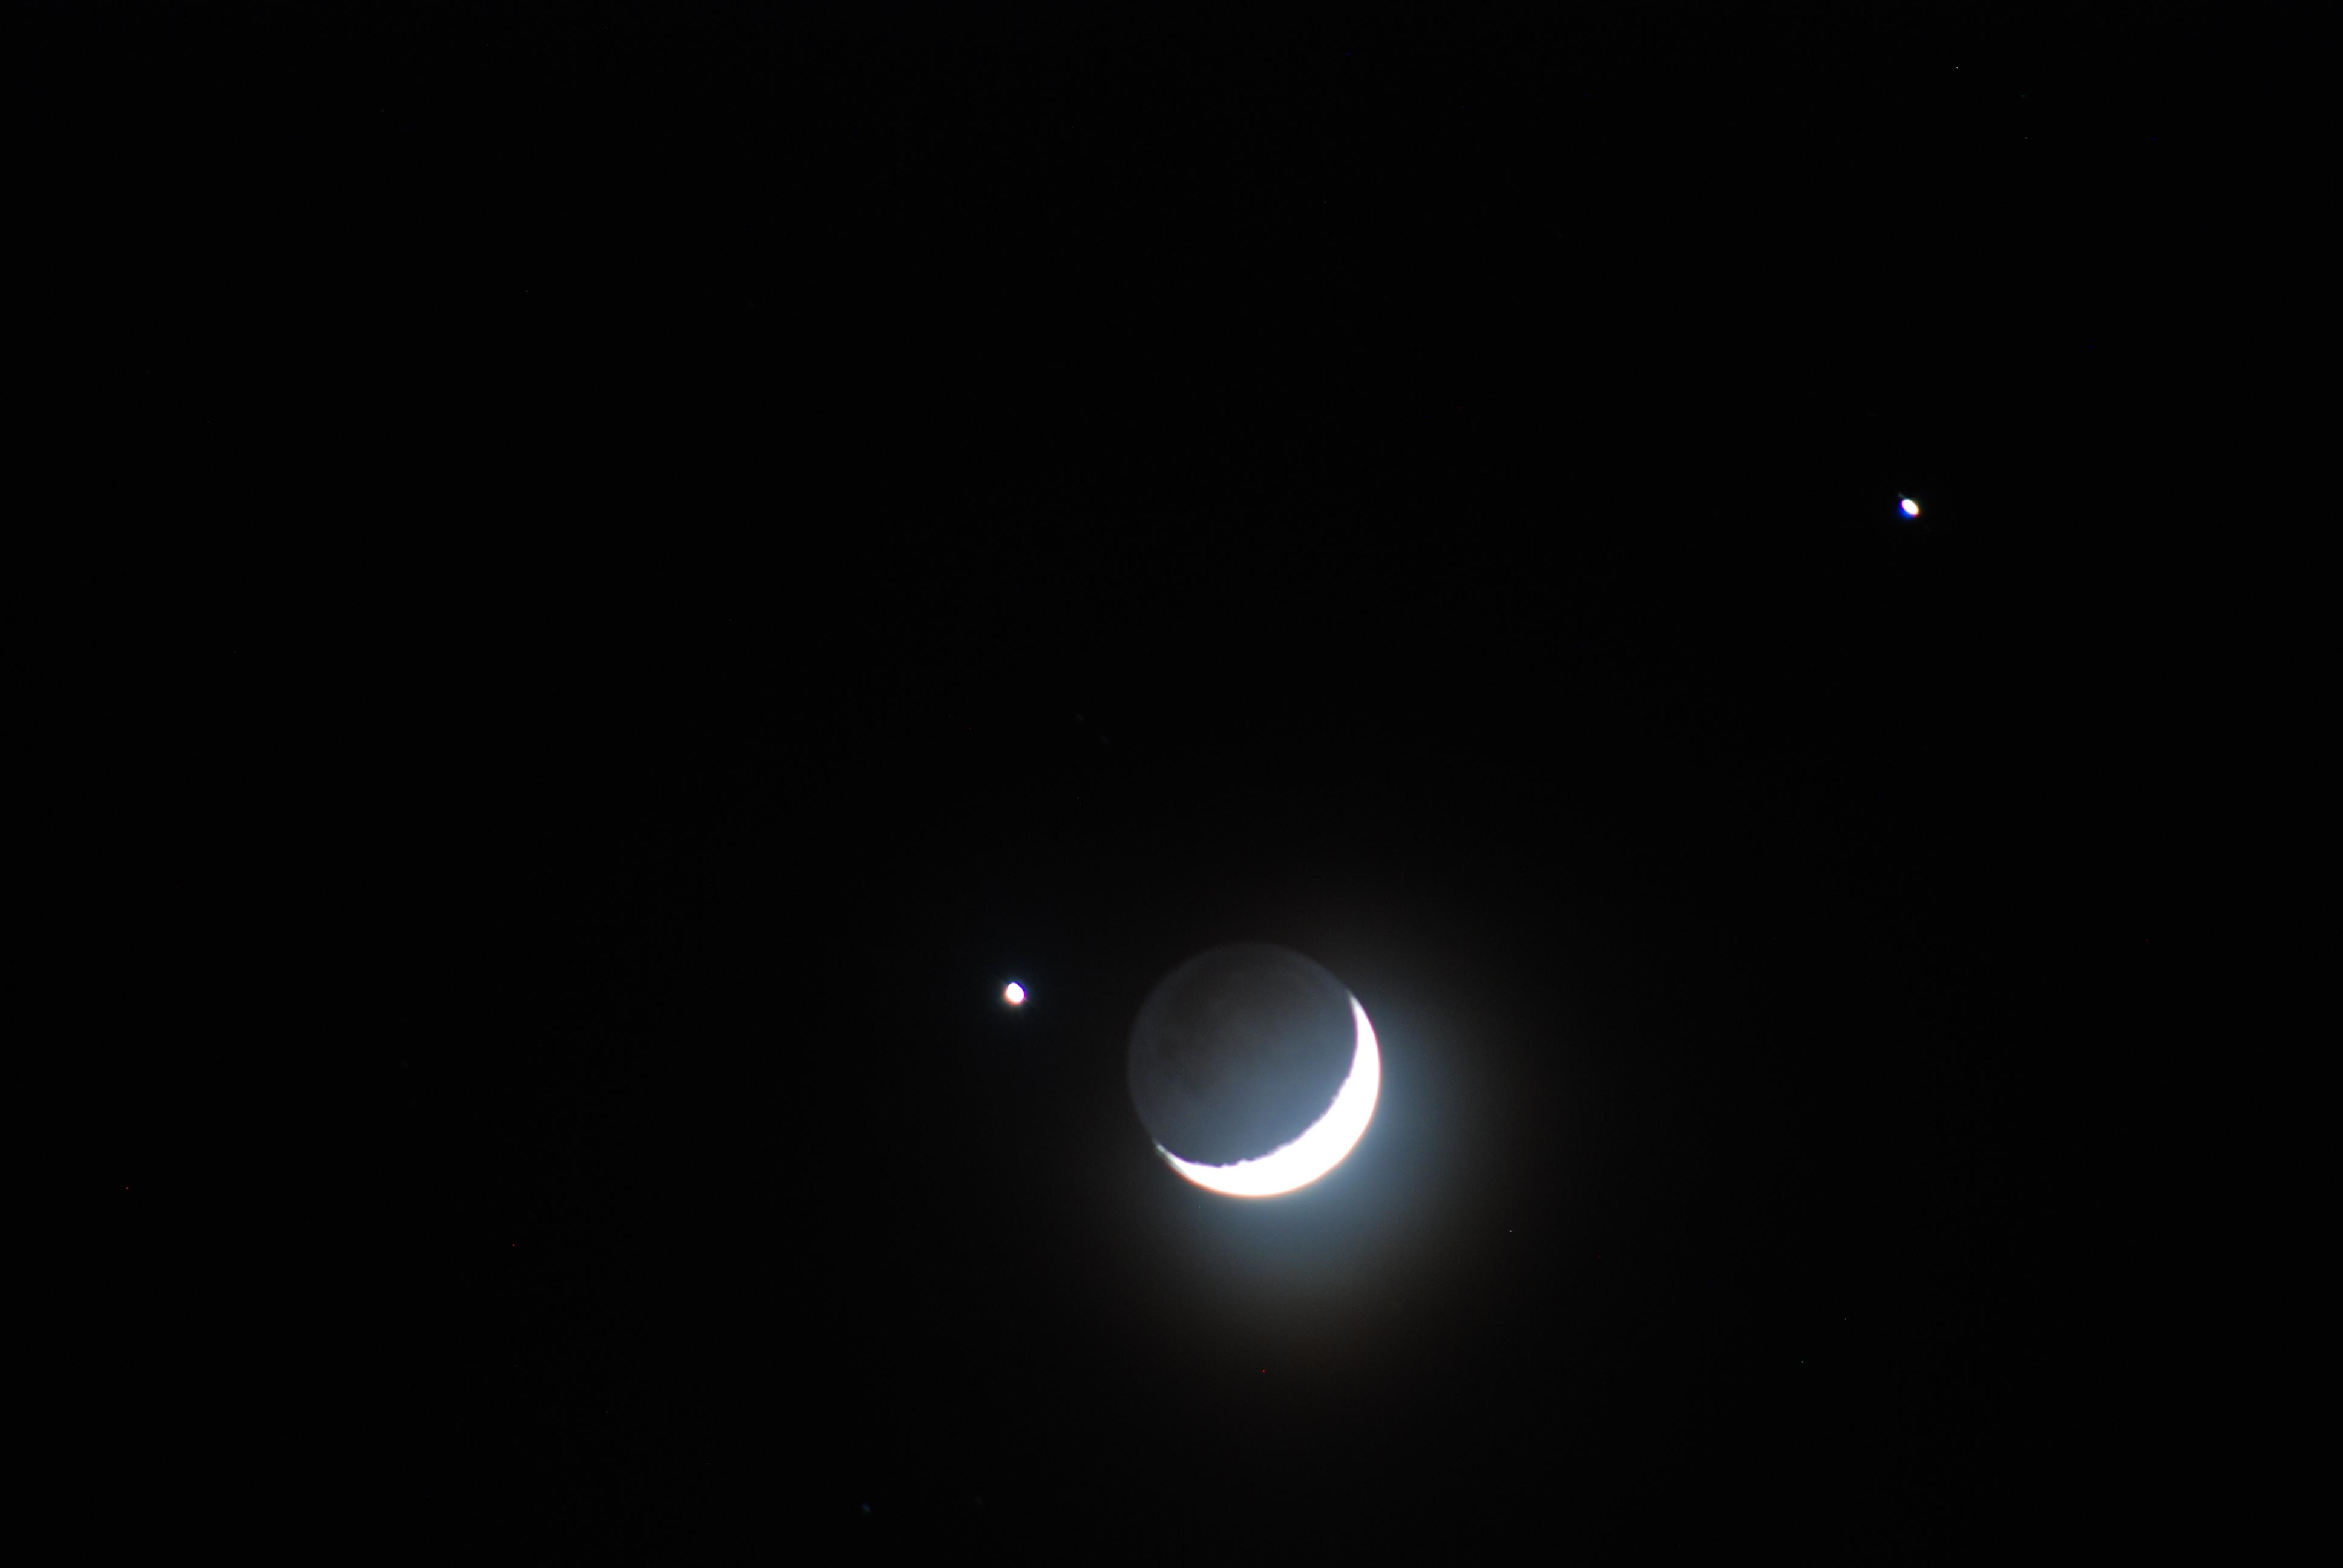 File:Jorge-11 - Night Skies (by).jpg - Wikimedia Commons